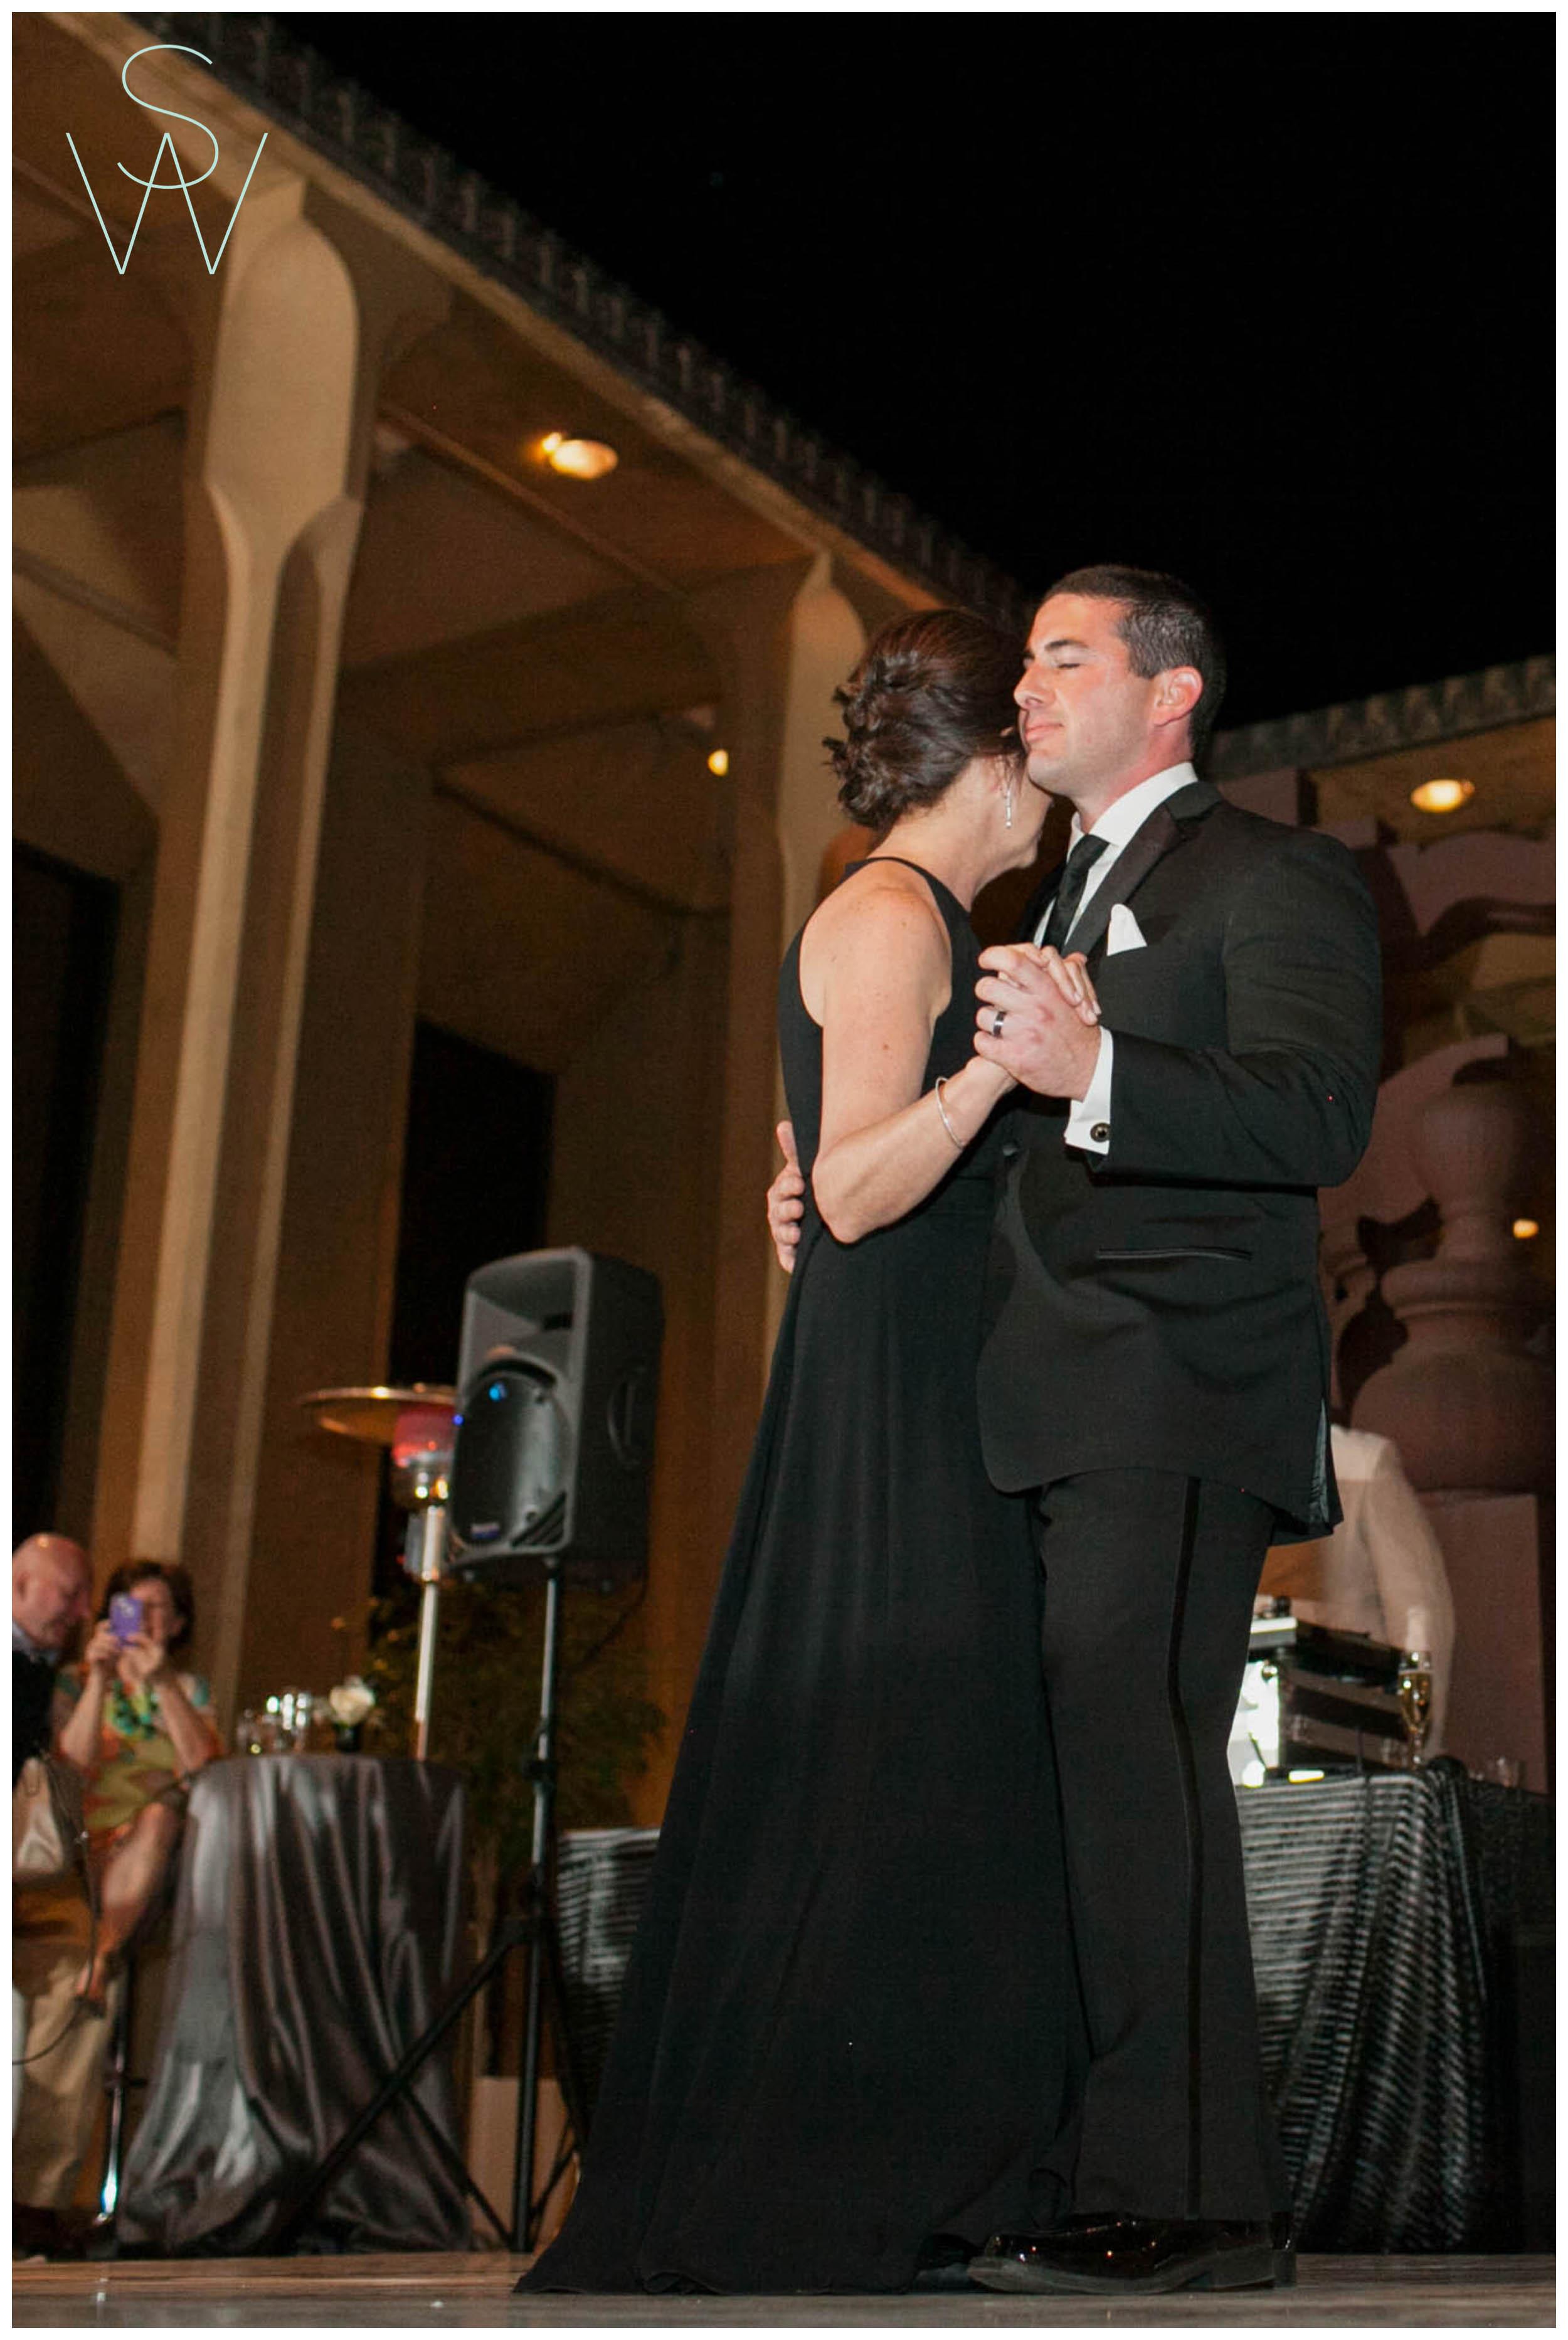 Shewanders.sdma_.wedding.photography-1096.jpg.wedding.photography-1096.jpg